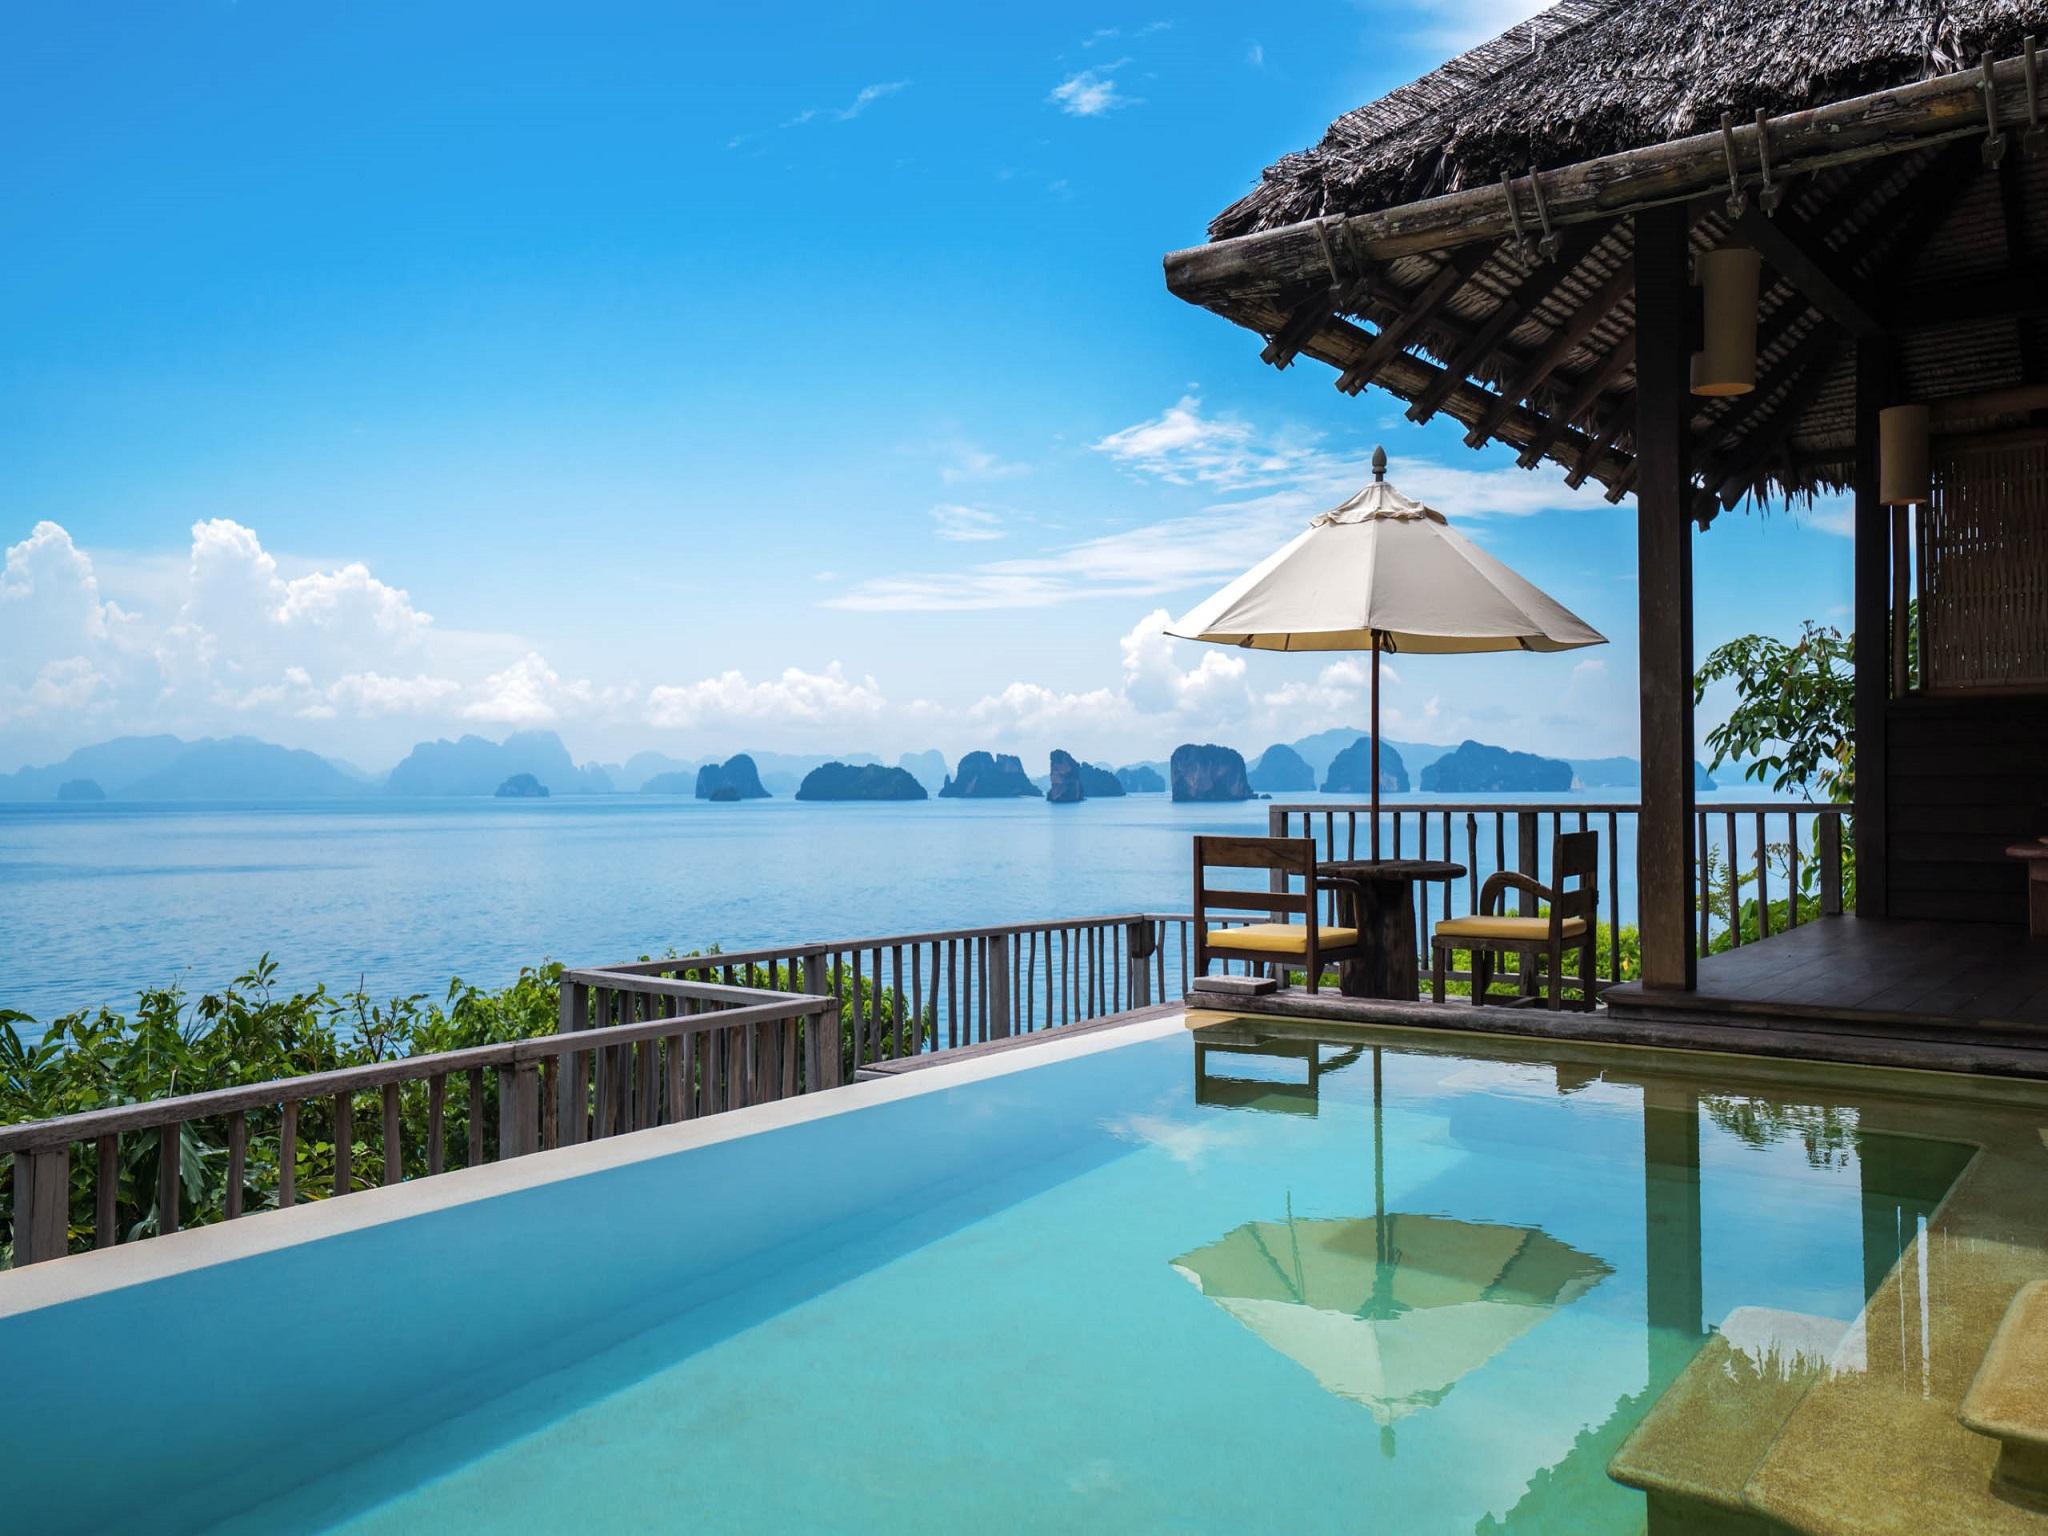 Six Senses Yao Noi - Top 10 best luxury resorts and hotels in Phuket